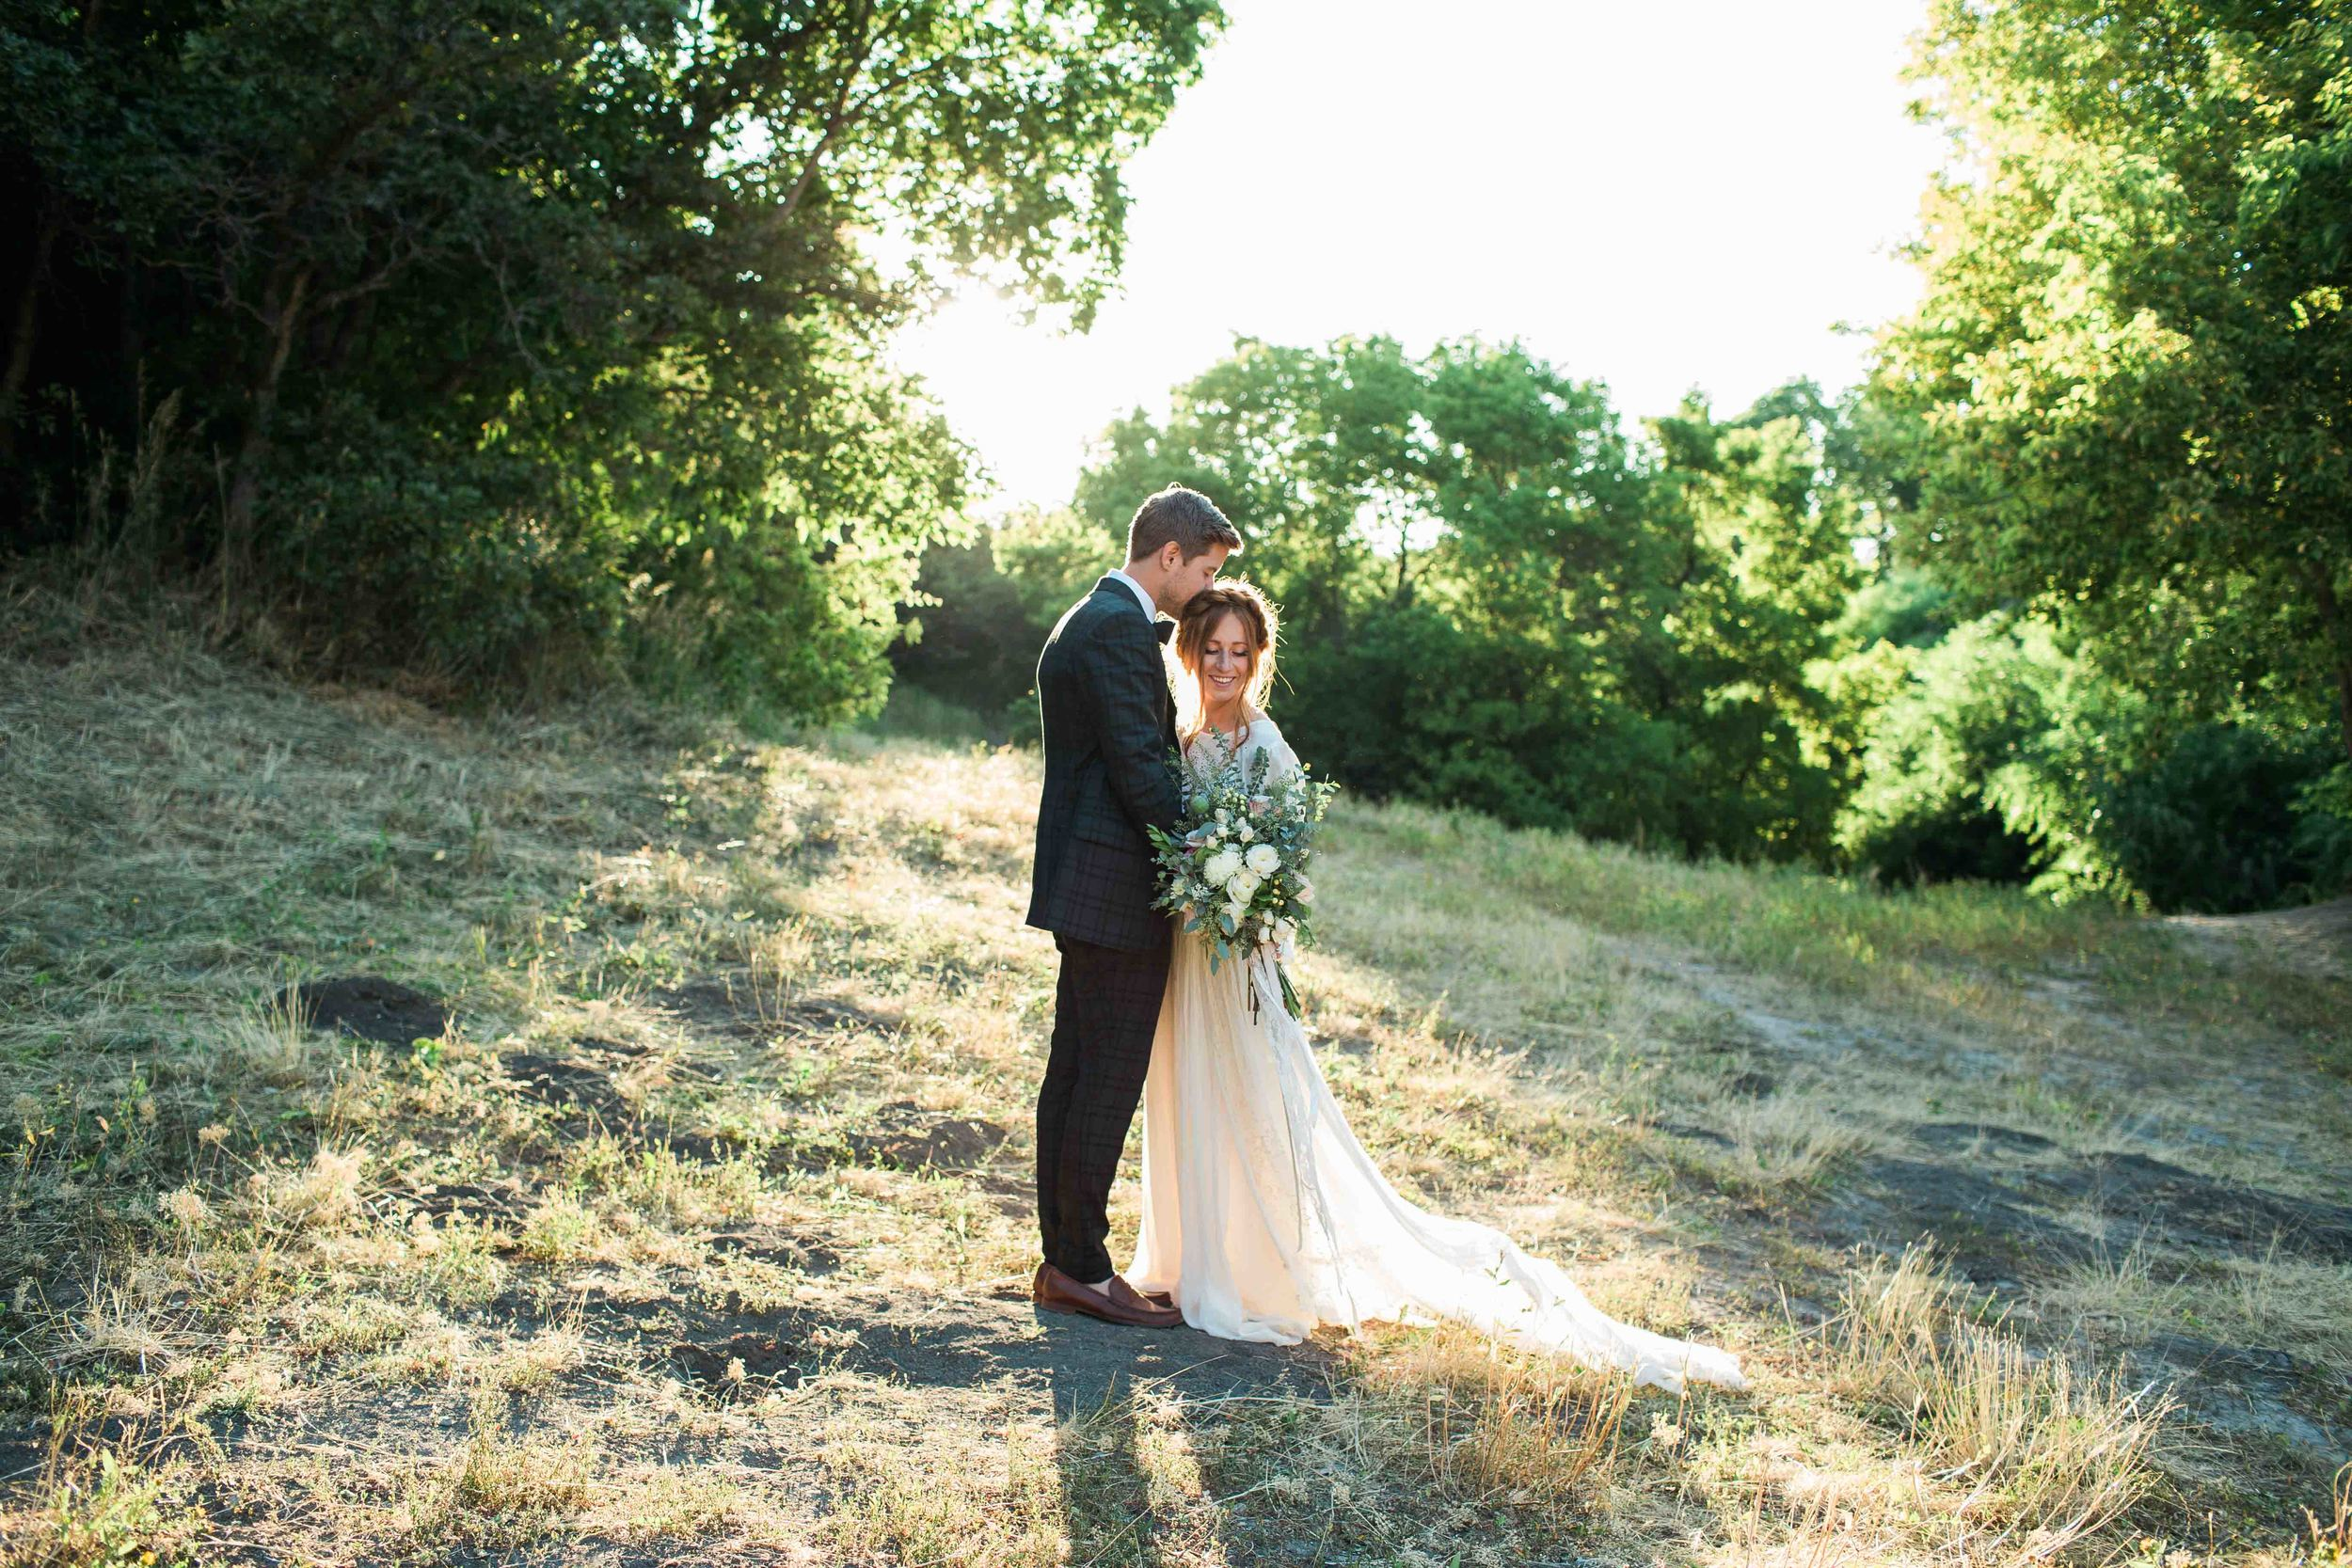 Salt-Lake-City-Utah-Wedding-Photographer-3.jpg